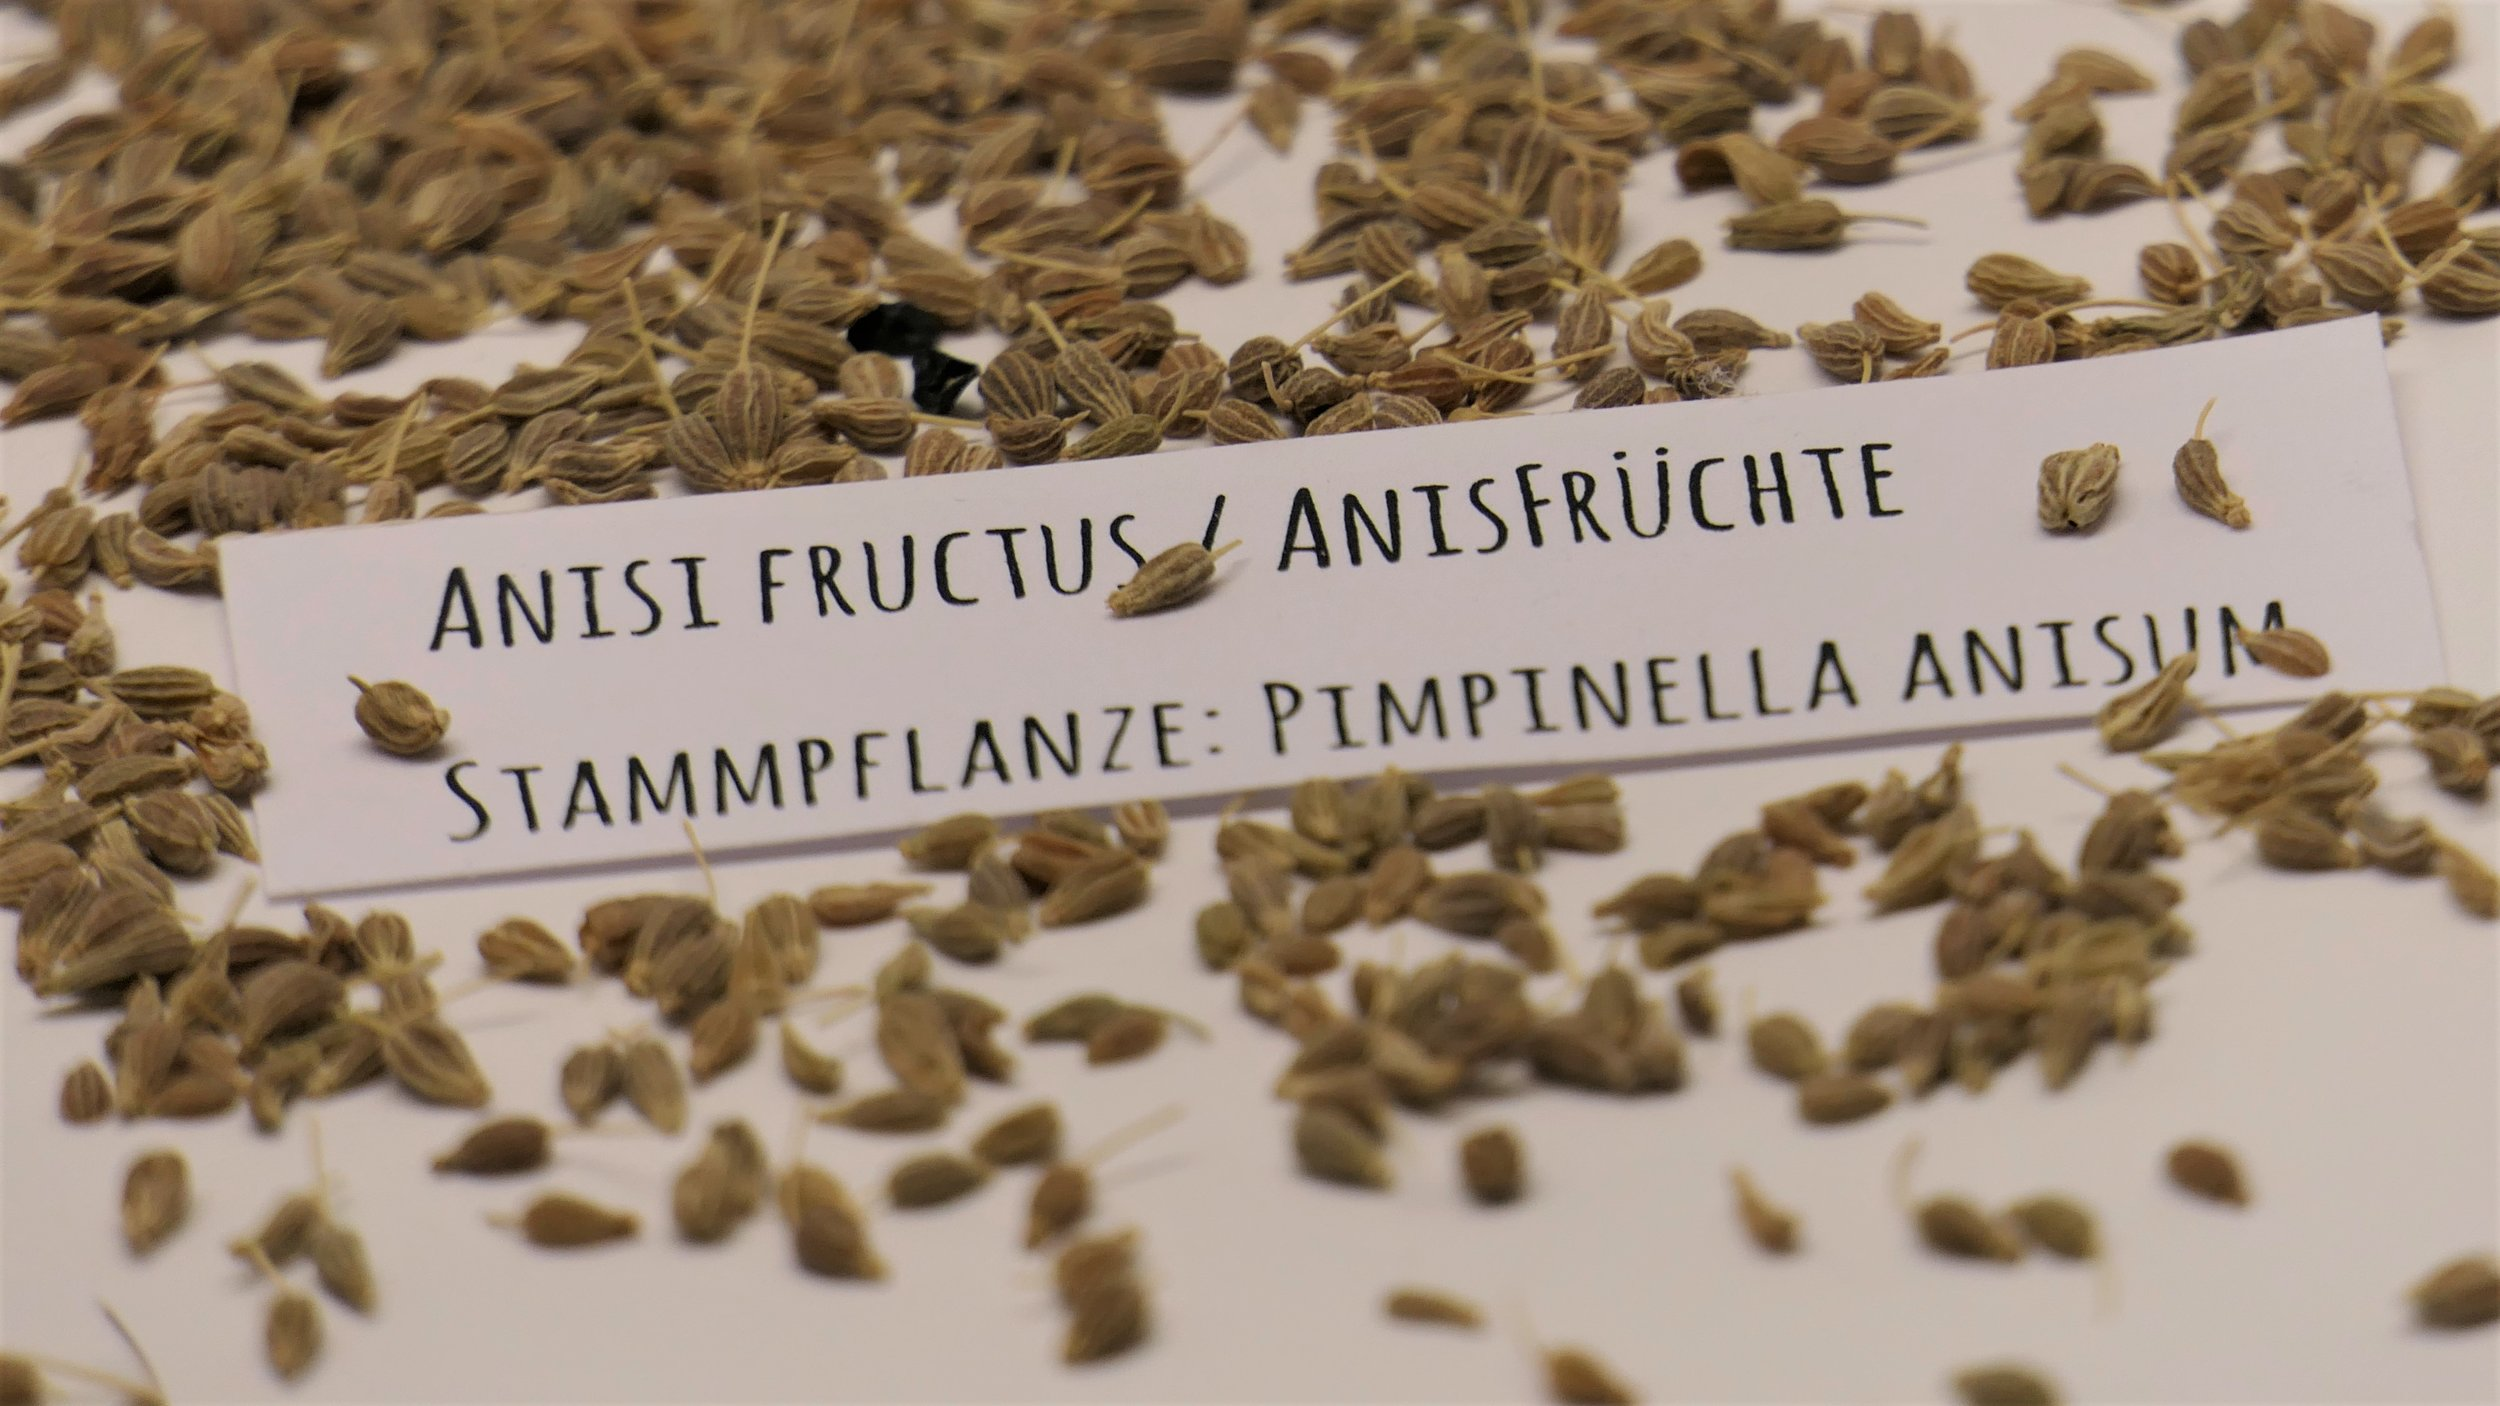 anisi_fructus.jpg